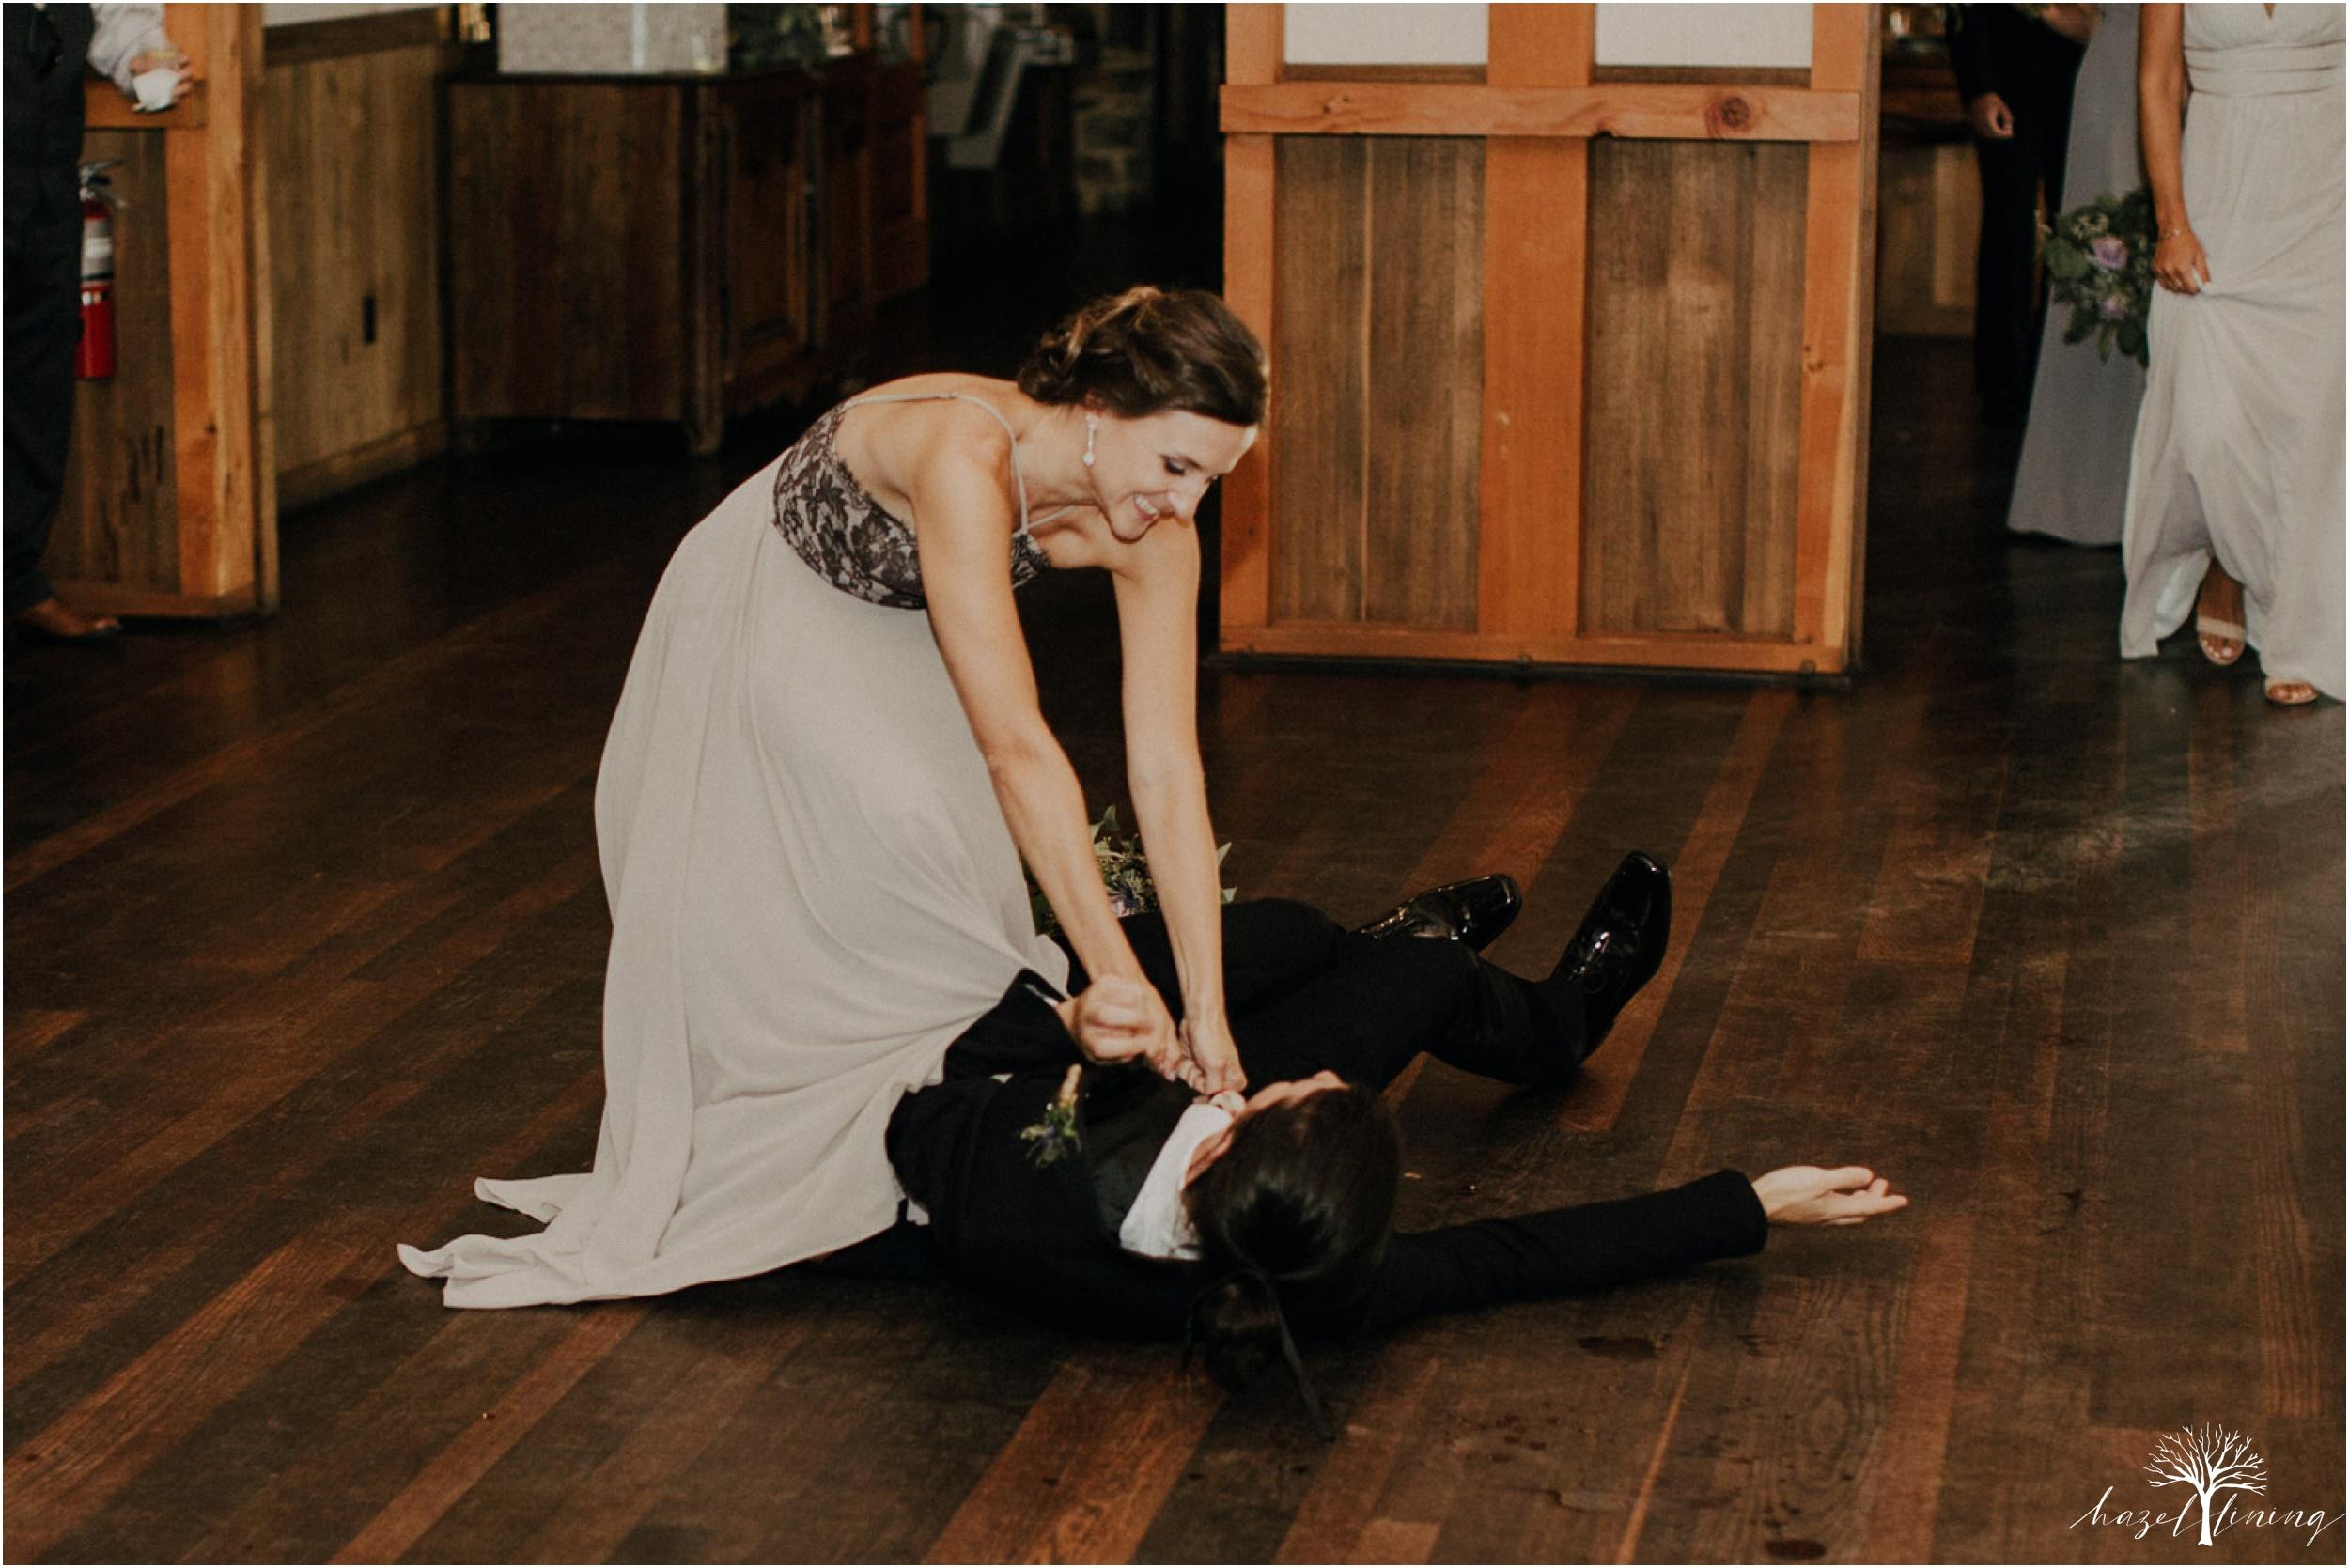 maureen-hepner-anthony-giordano-rose-bank-winery-newtow-pennsylvania-luxury-summer-wedding-hazel-lining-photography-destination-elopement-wedding-engagement-photography_0130.jpg